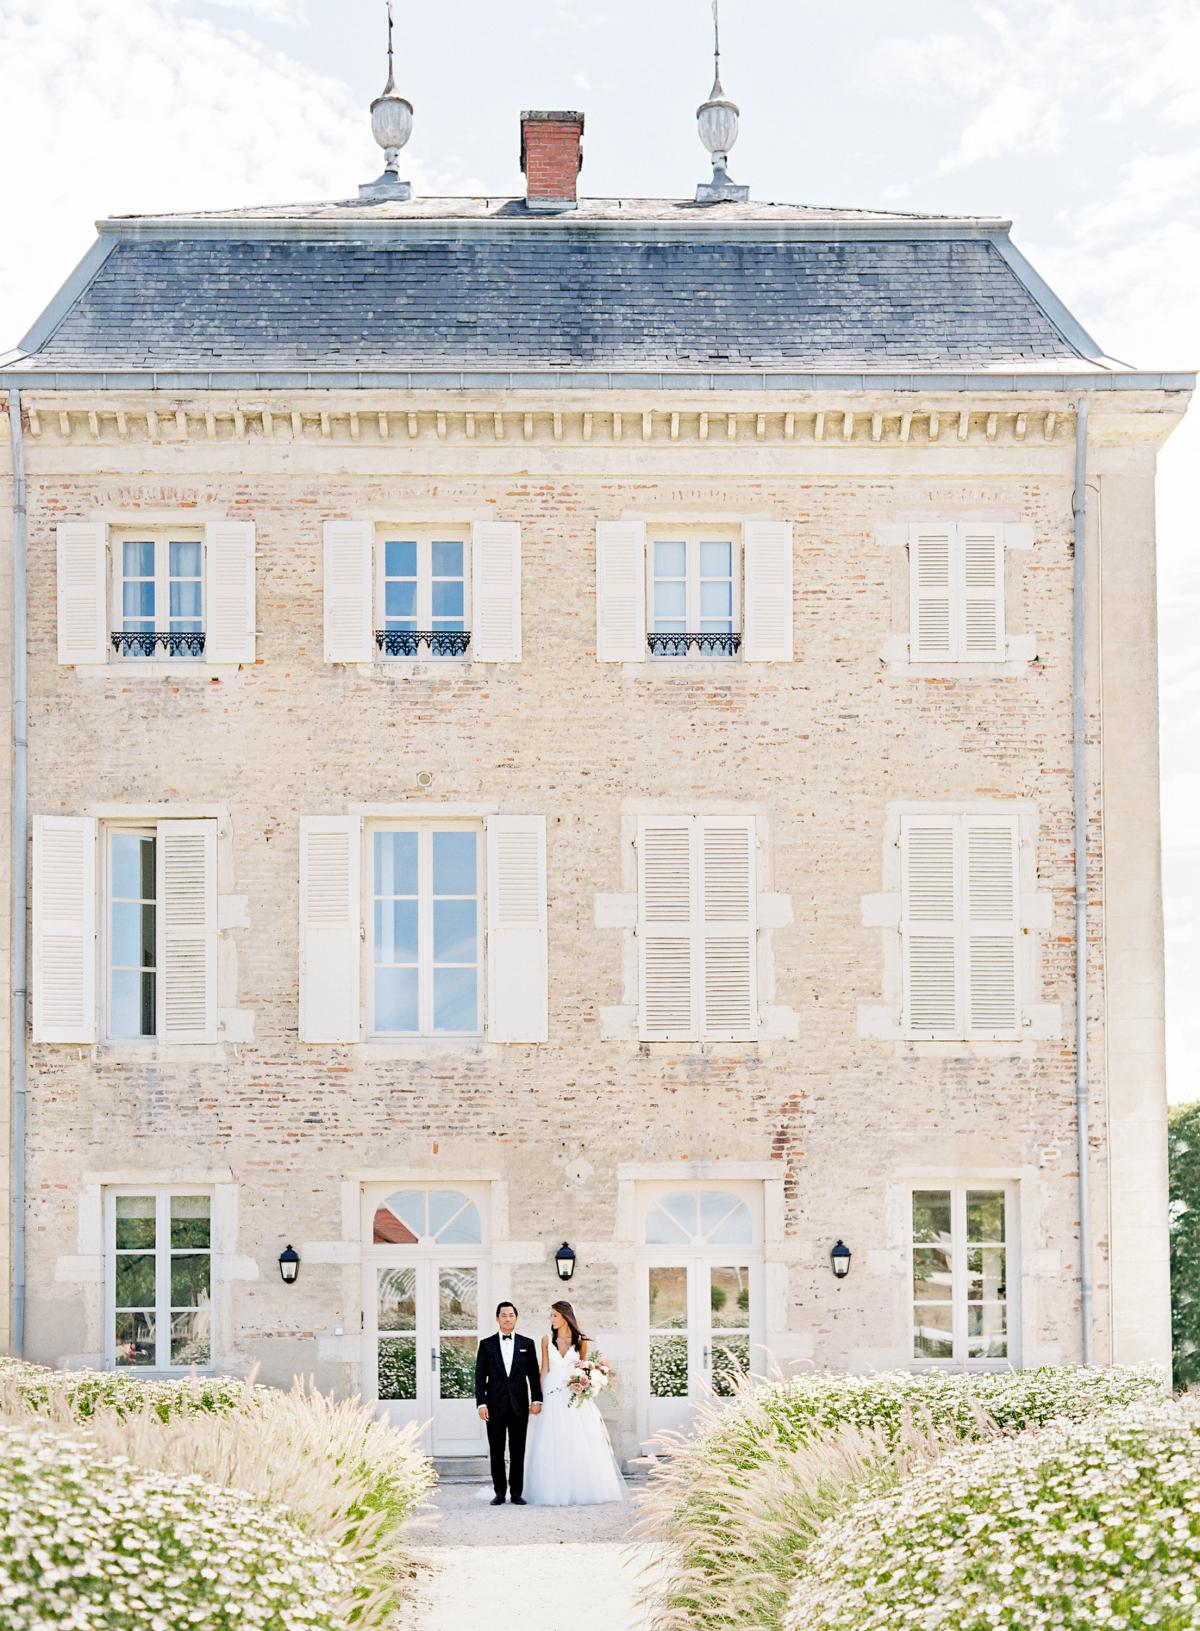 Chateau De Varennes Sinclair And Moore Wedding 0148